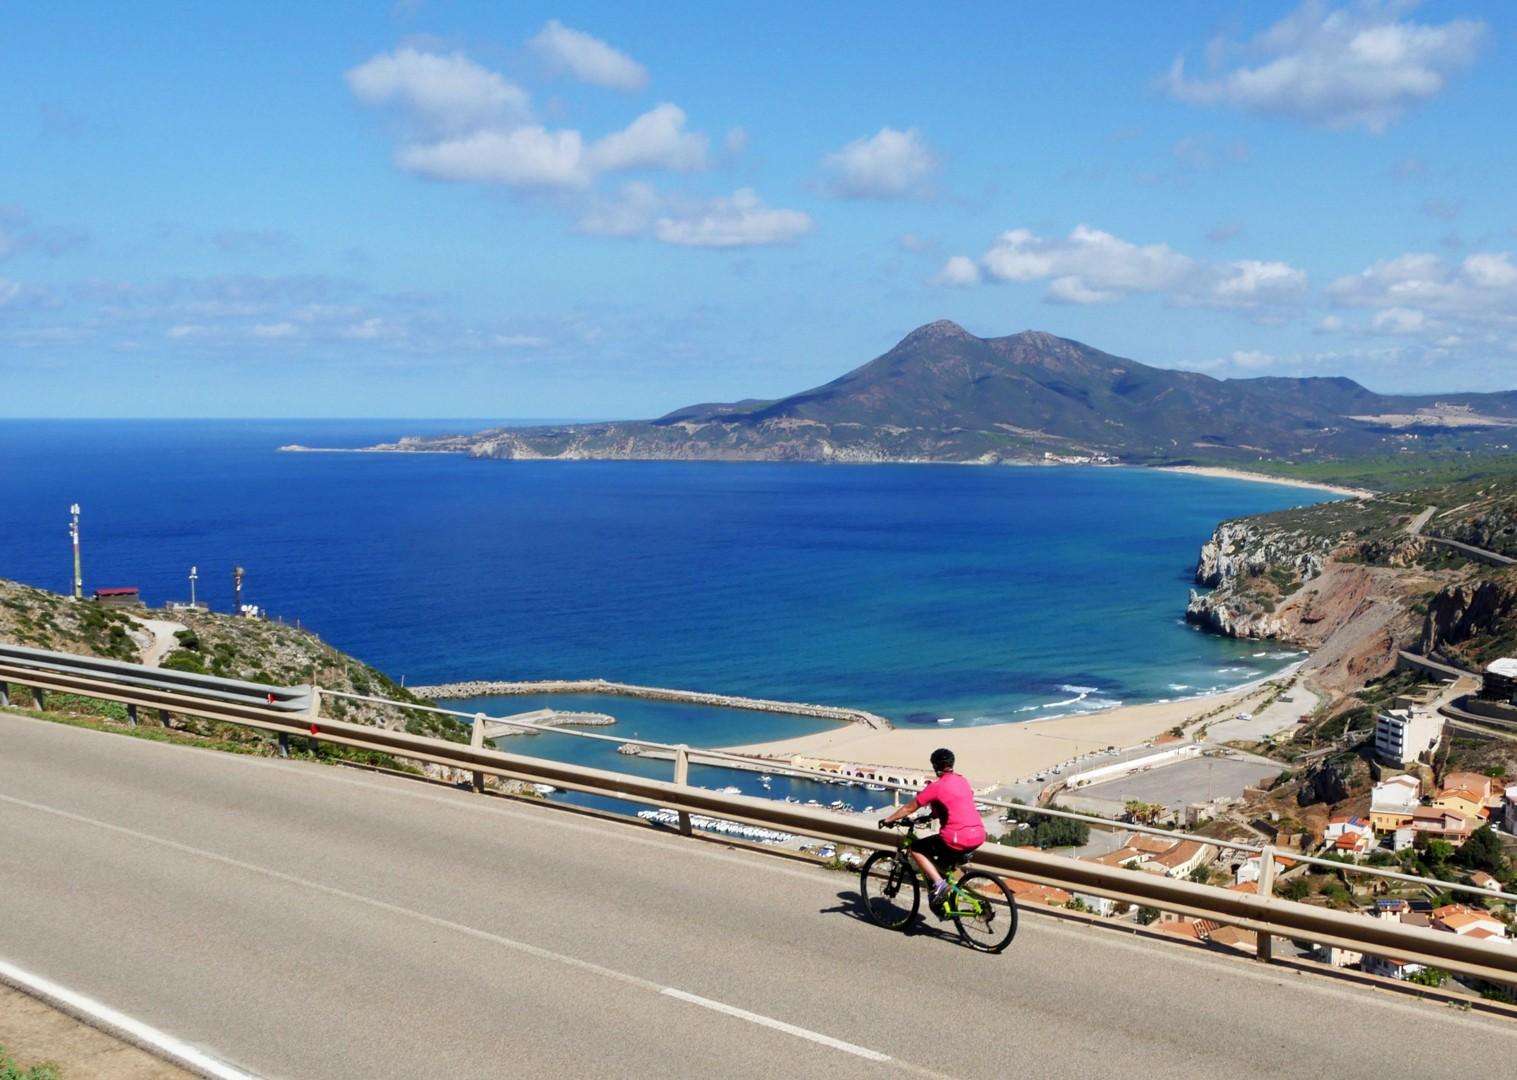 sardinia-island-cycling-holiday.jpg - Sardinia - Island Flavours - Guided Leisure Cycling Holiday - Leisure Cycling